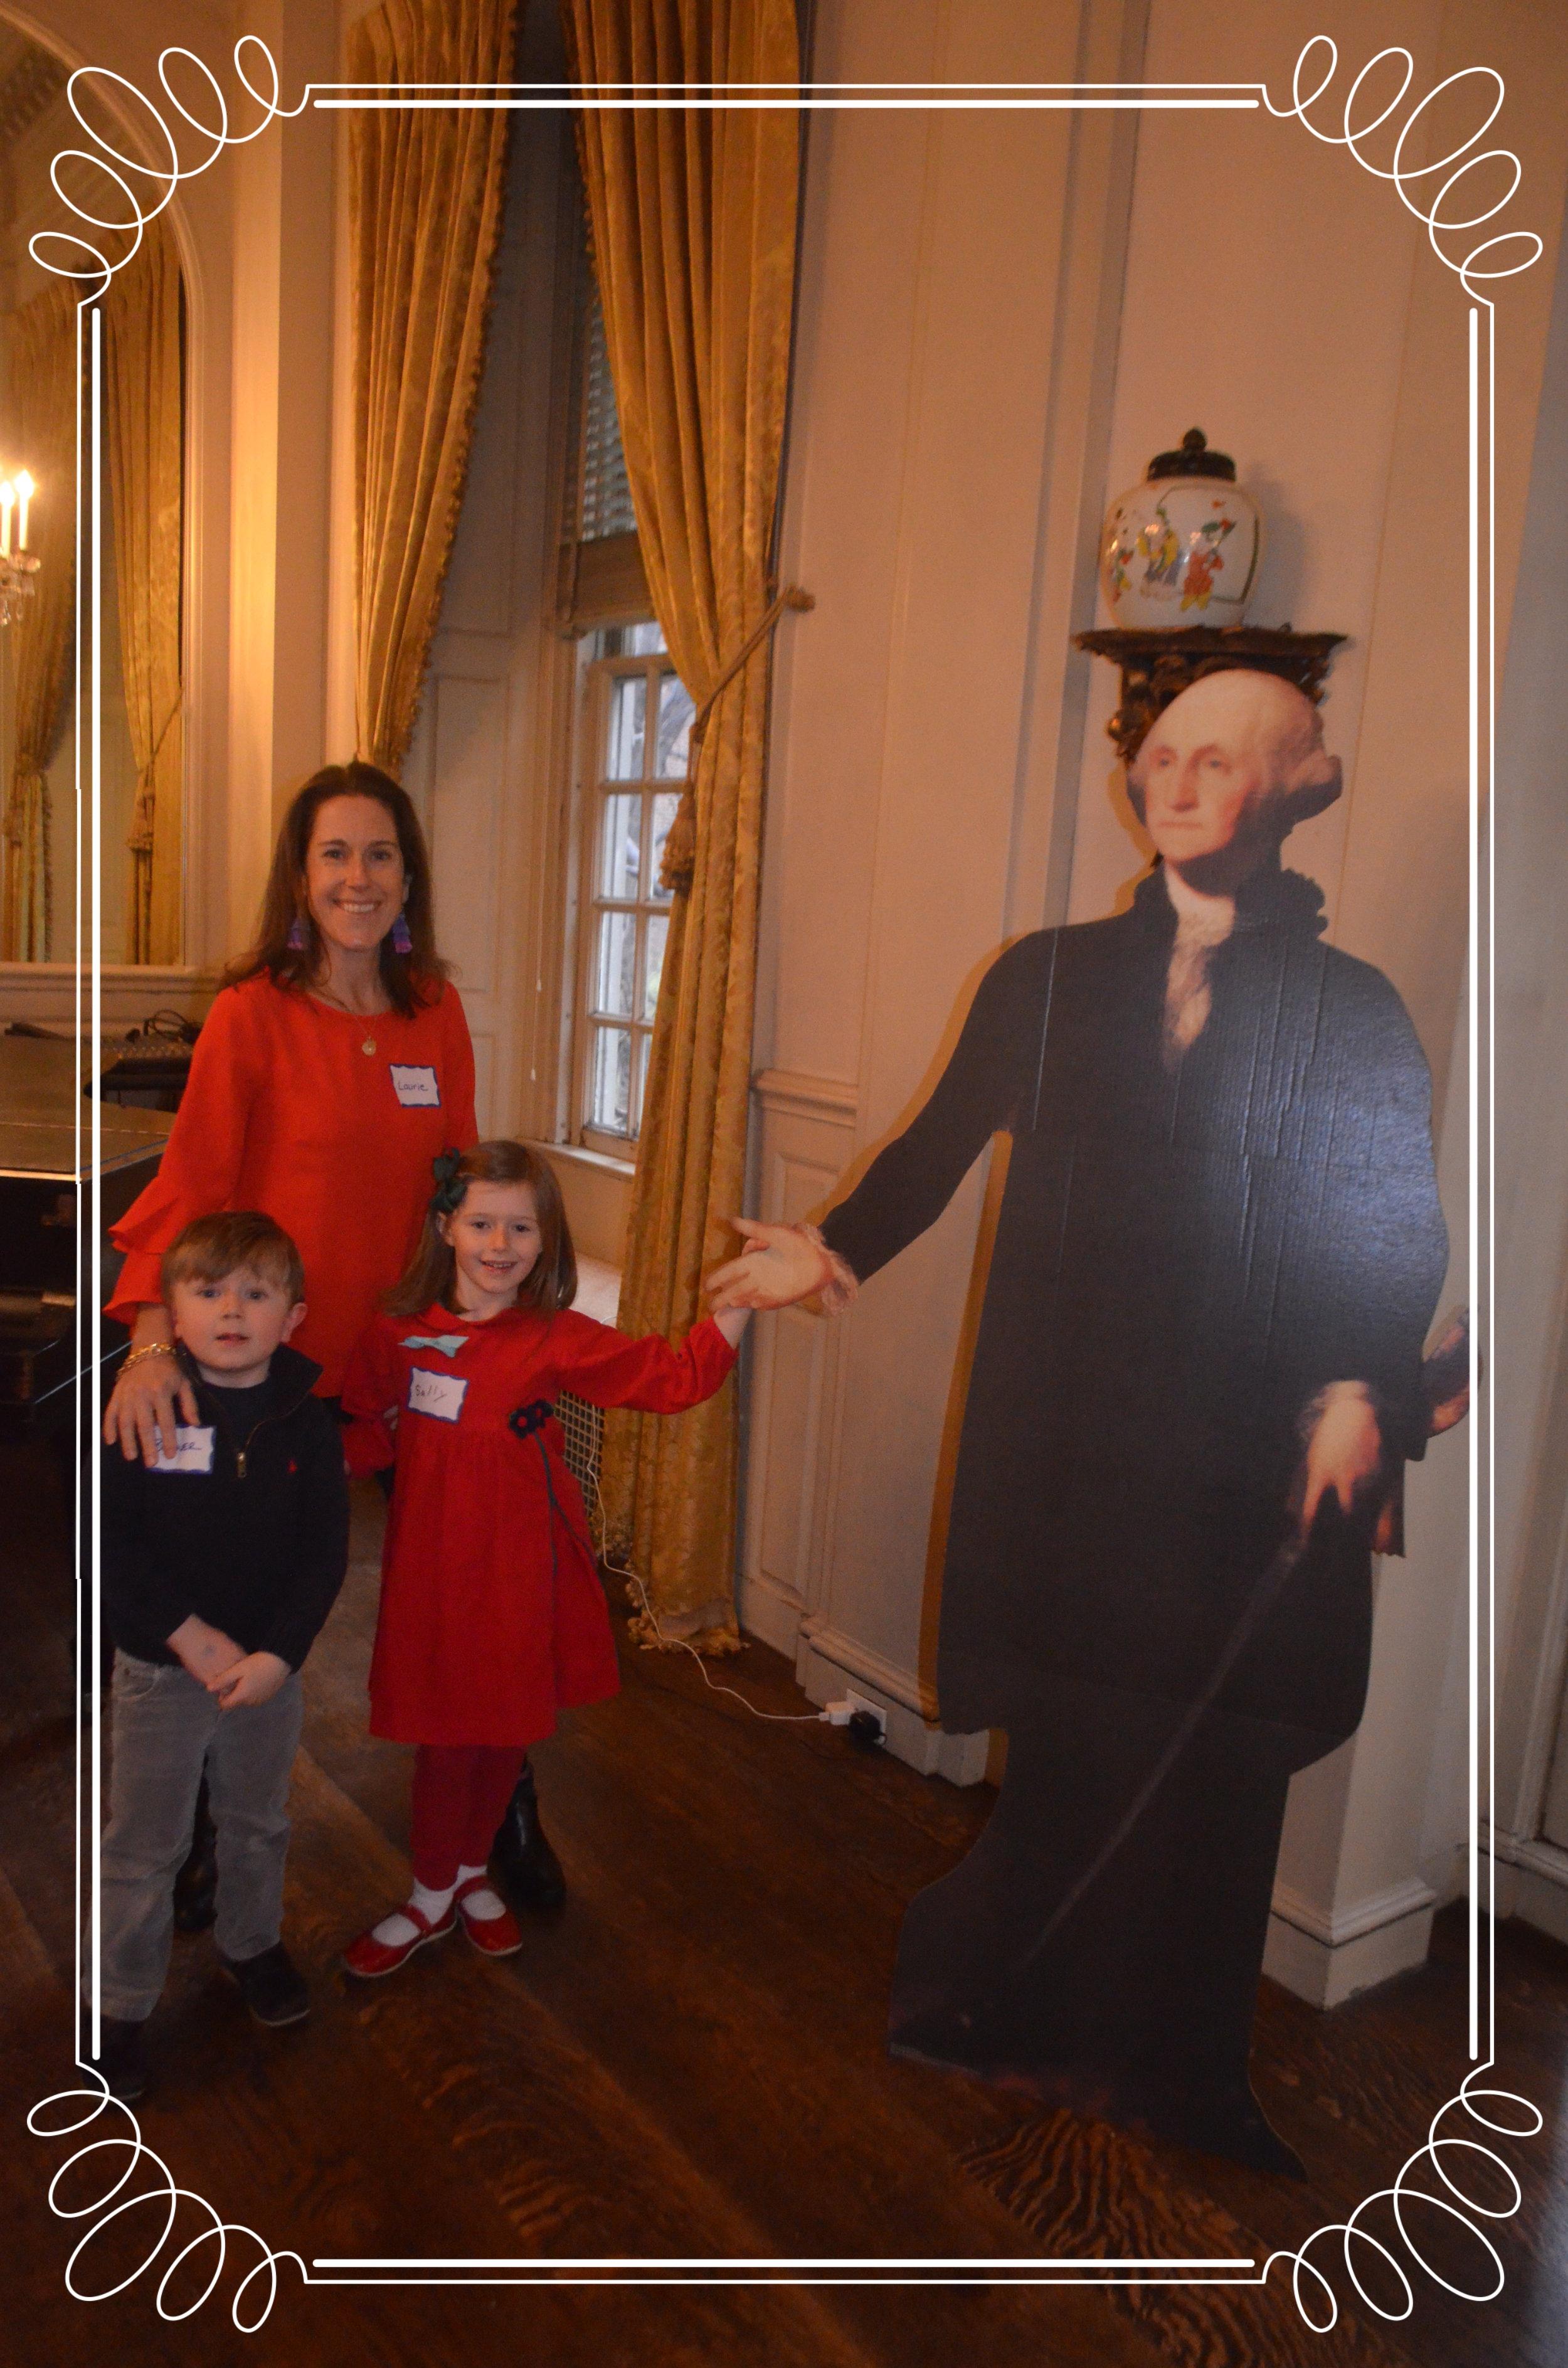 2018-02-23 George Washington's Birthday Party  (7).JPG